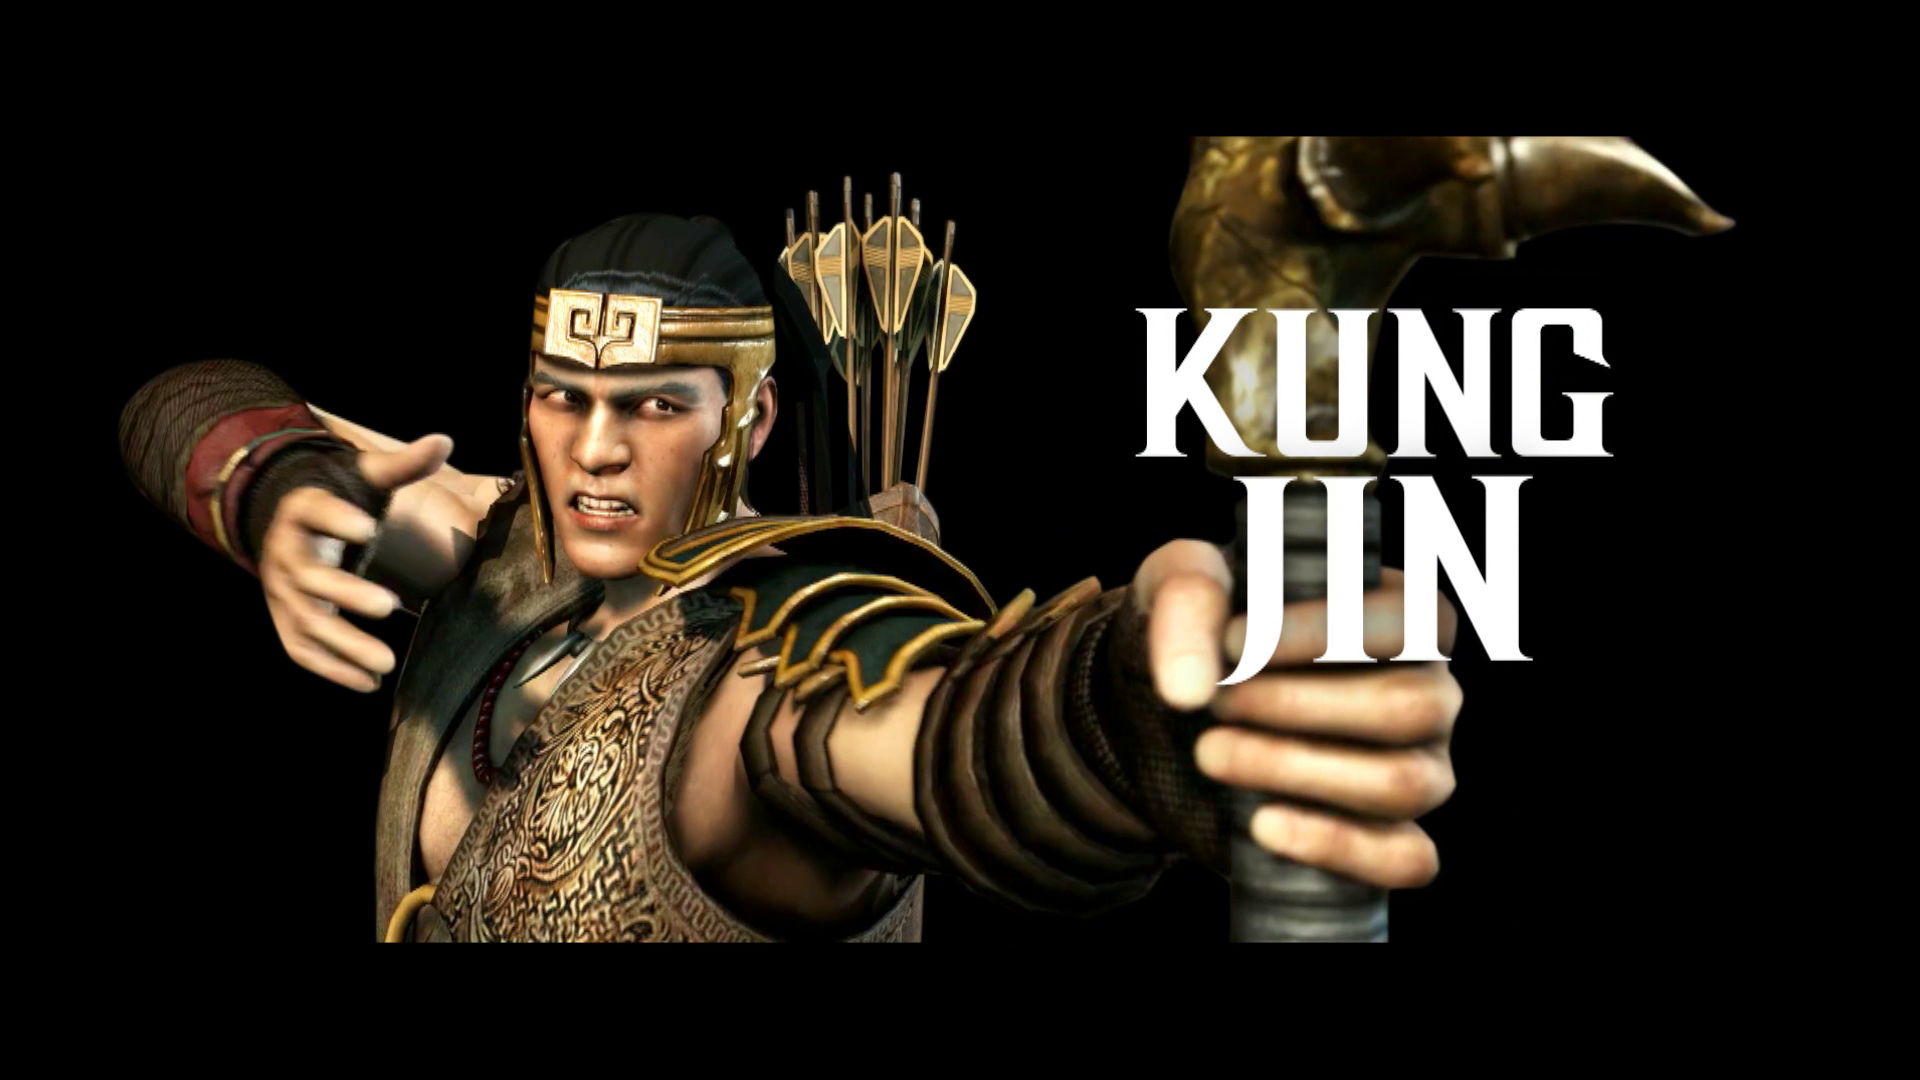 Mortal kombat gay porn kung jin